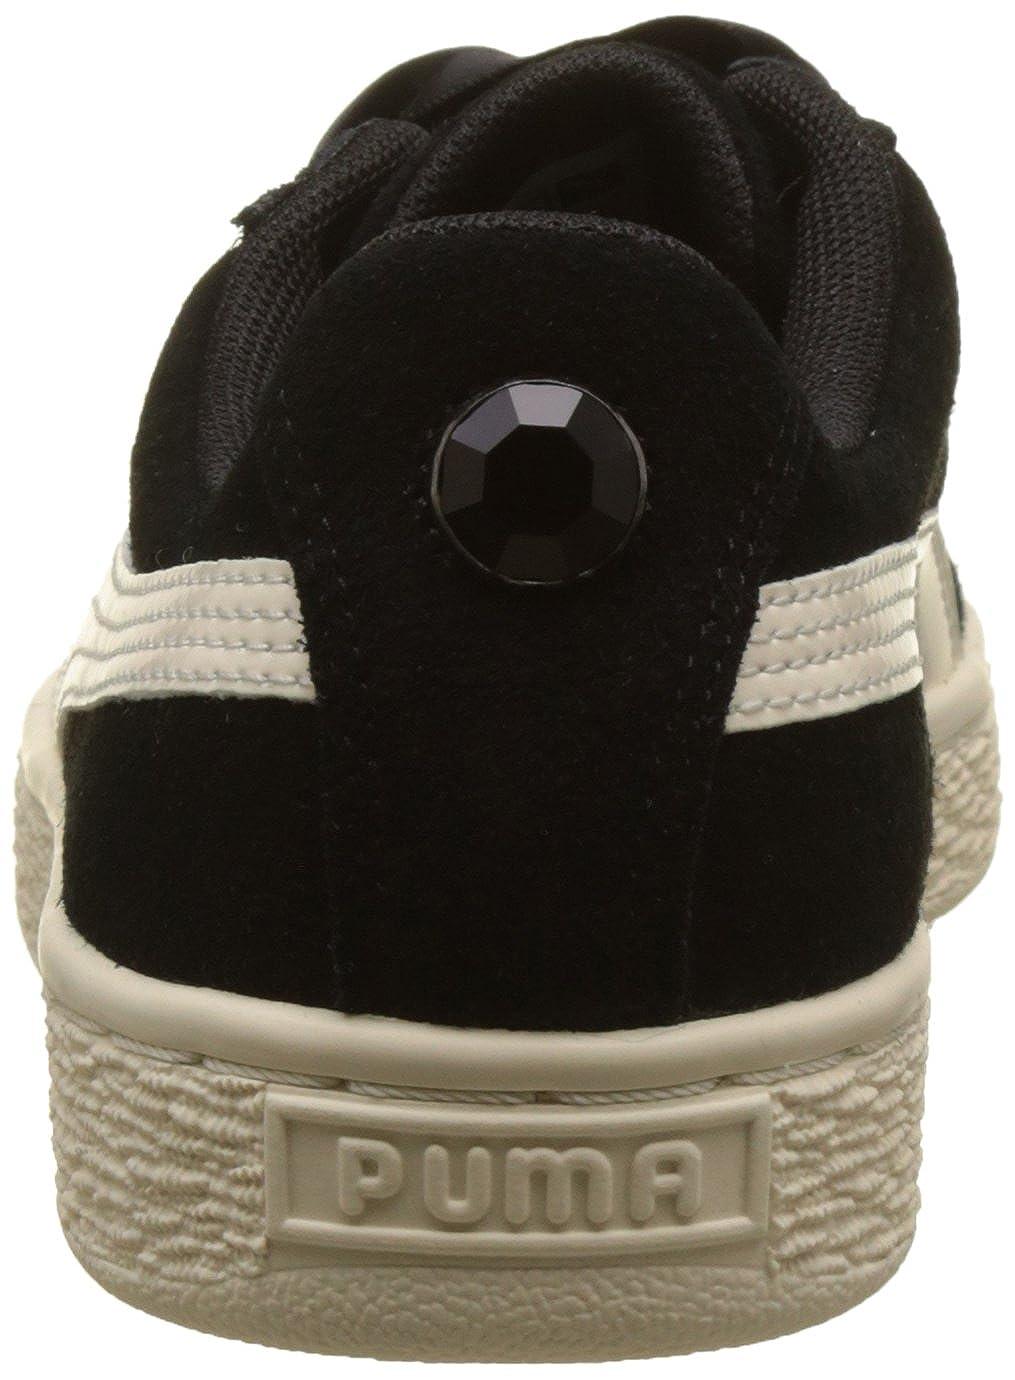 PUMA Girls Suede Heart Jewel Trainers US7 Black